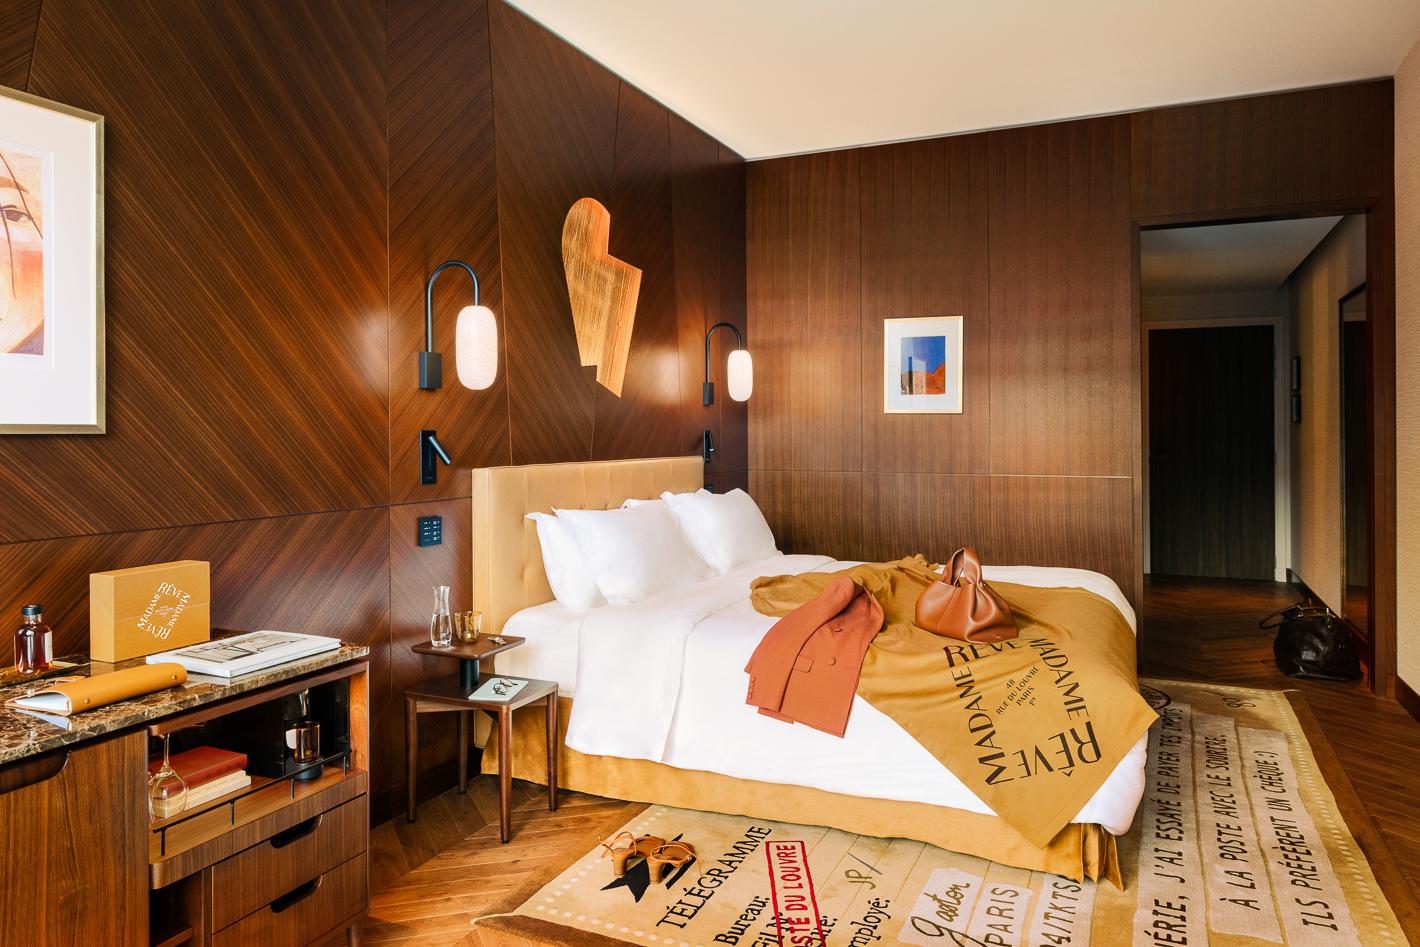 executive-vue-jardin-terrasse-hotel-madame-reve-1